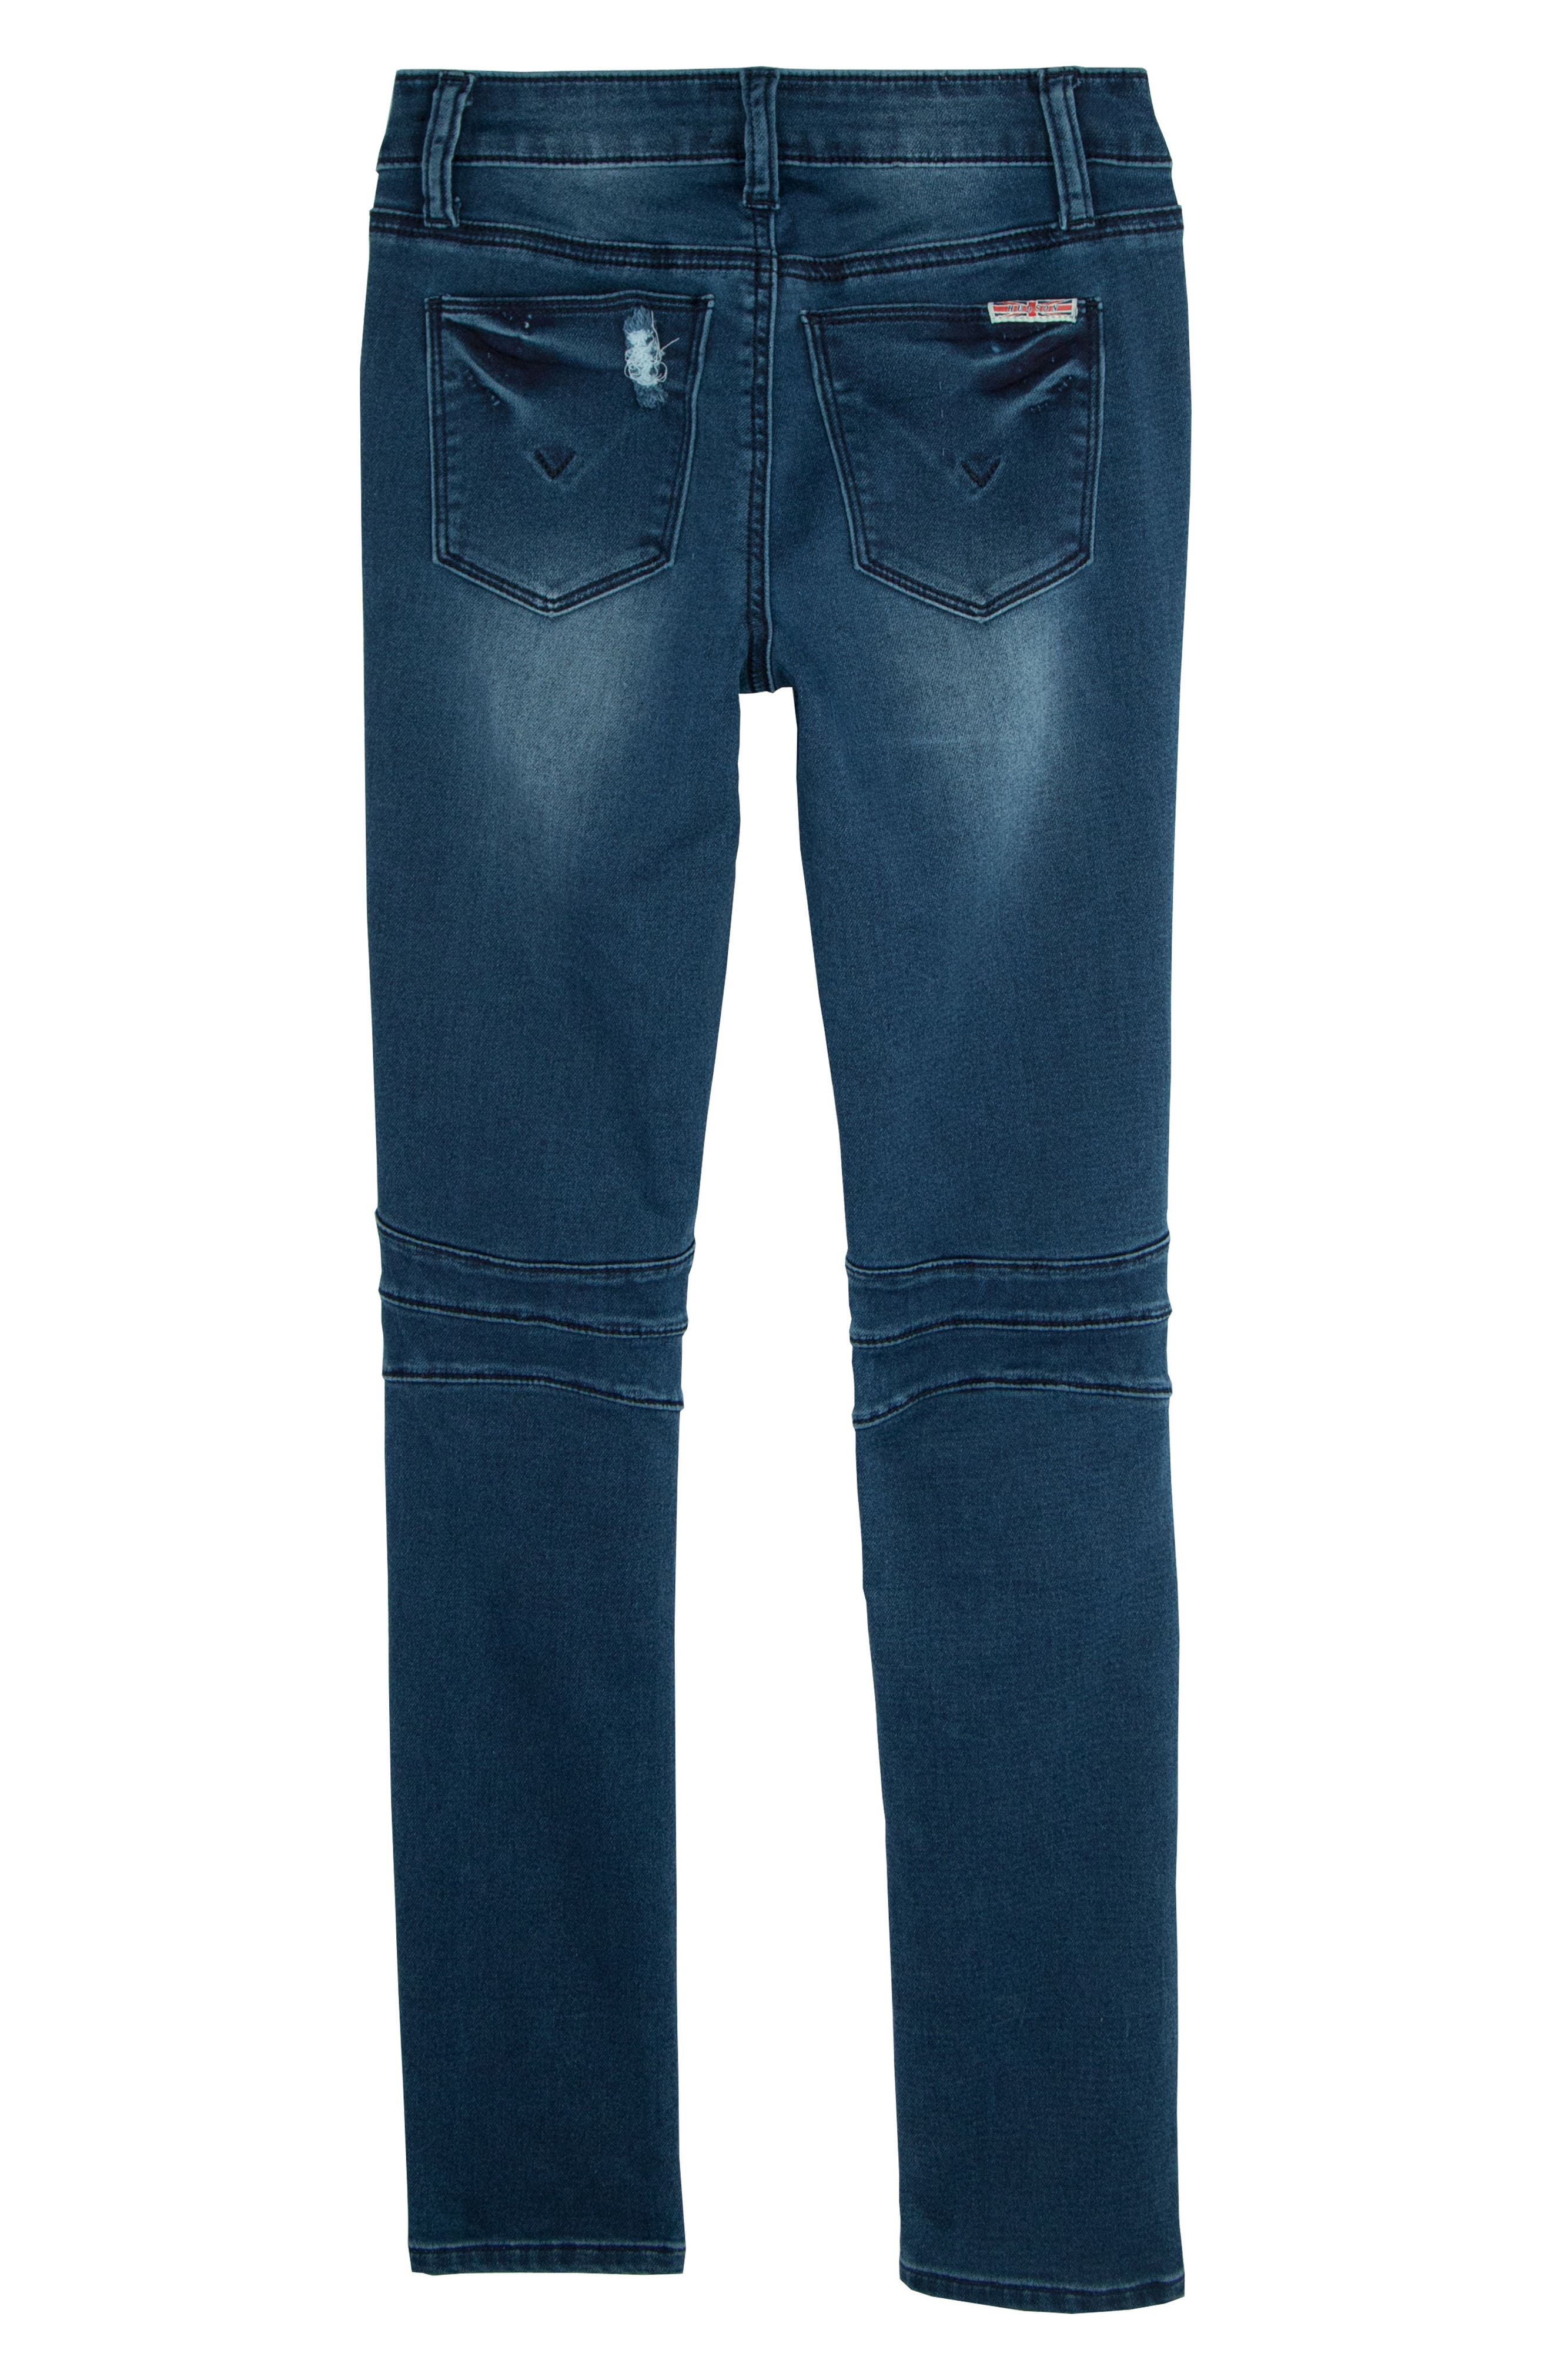 London Distressed Moto Skinny Jeans,                             Alternate thumbnail 2, color,                             Shaken Blue